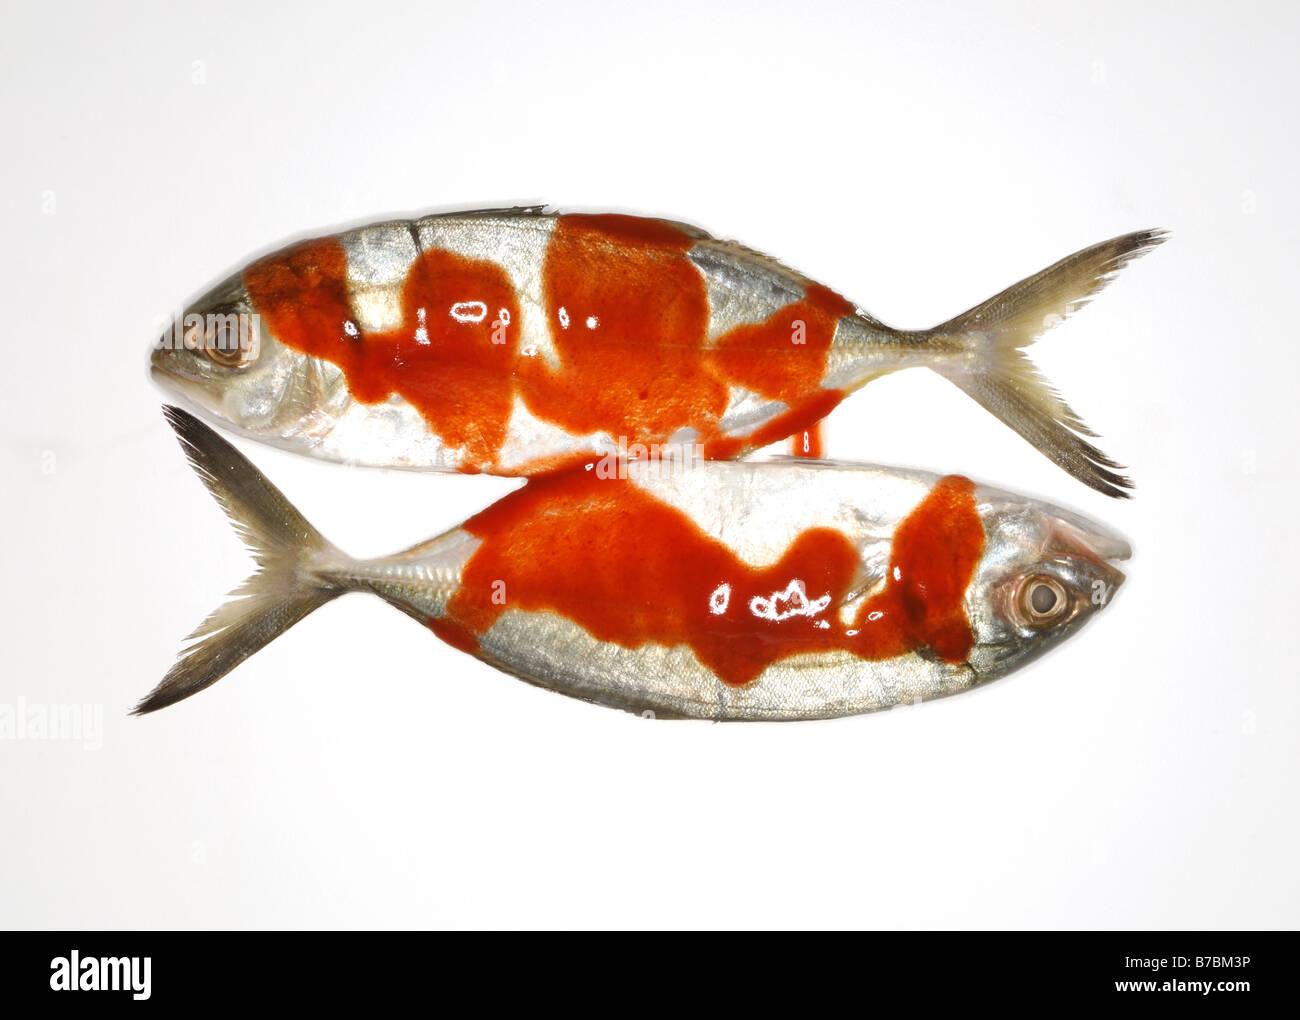 Flat Head Fish Stock Photos & Flat Head Fish Stock Images - Alamy